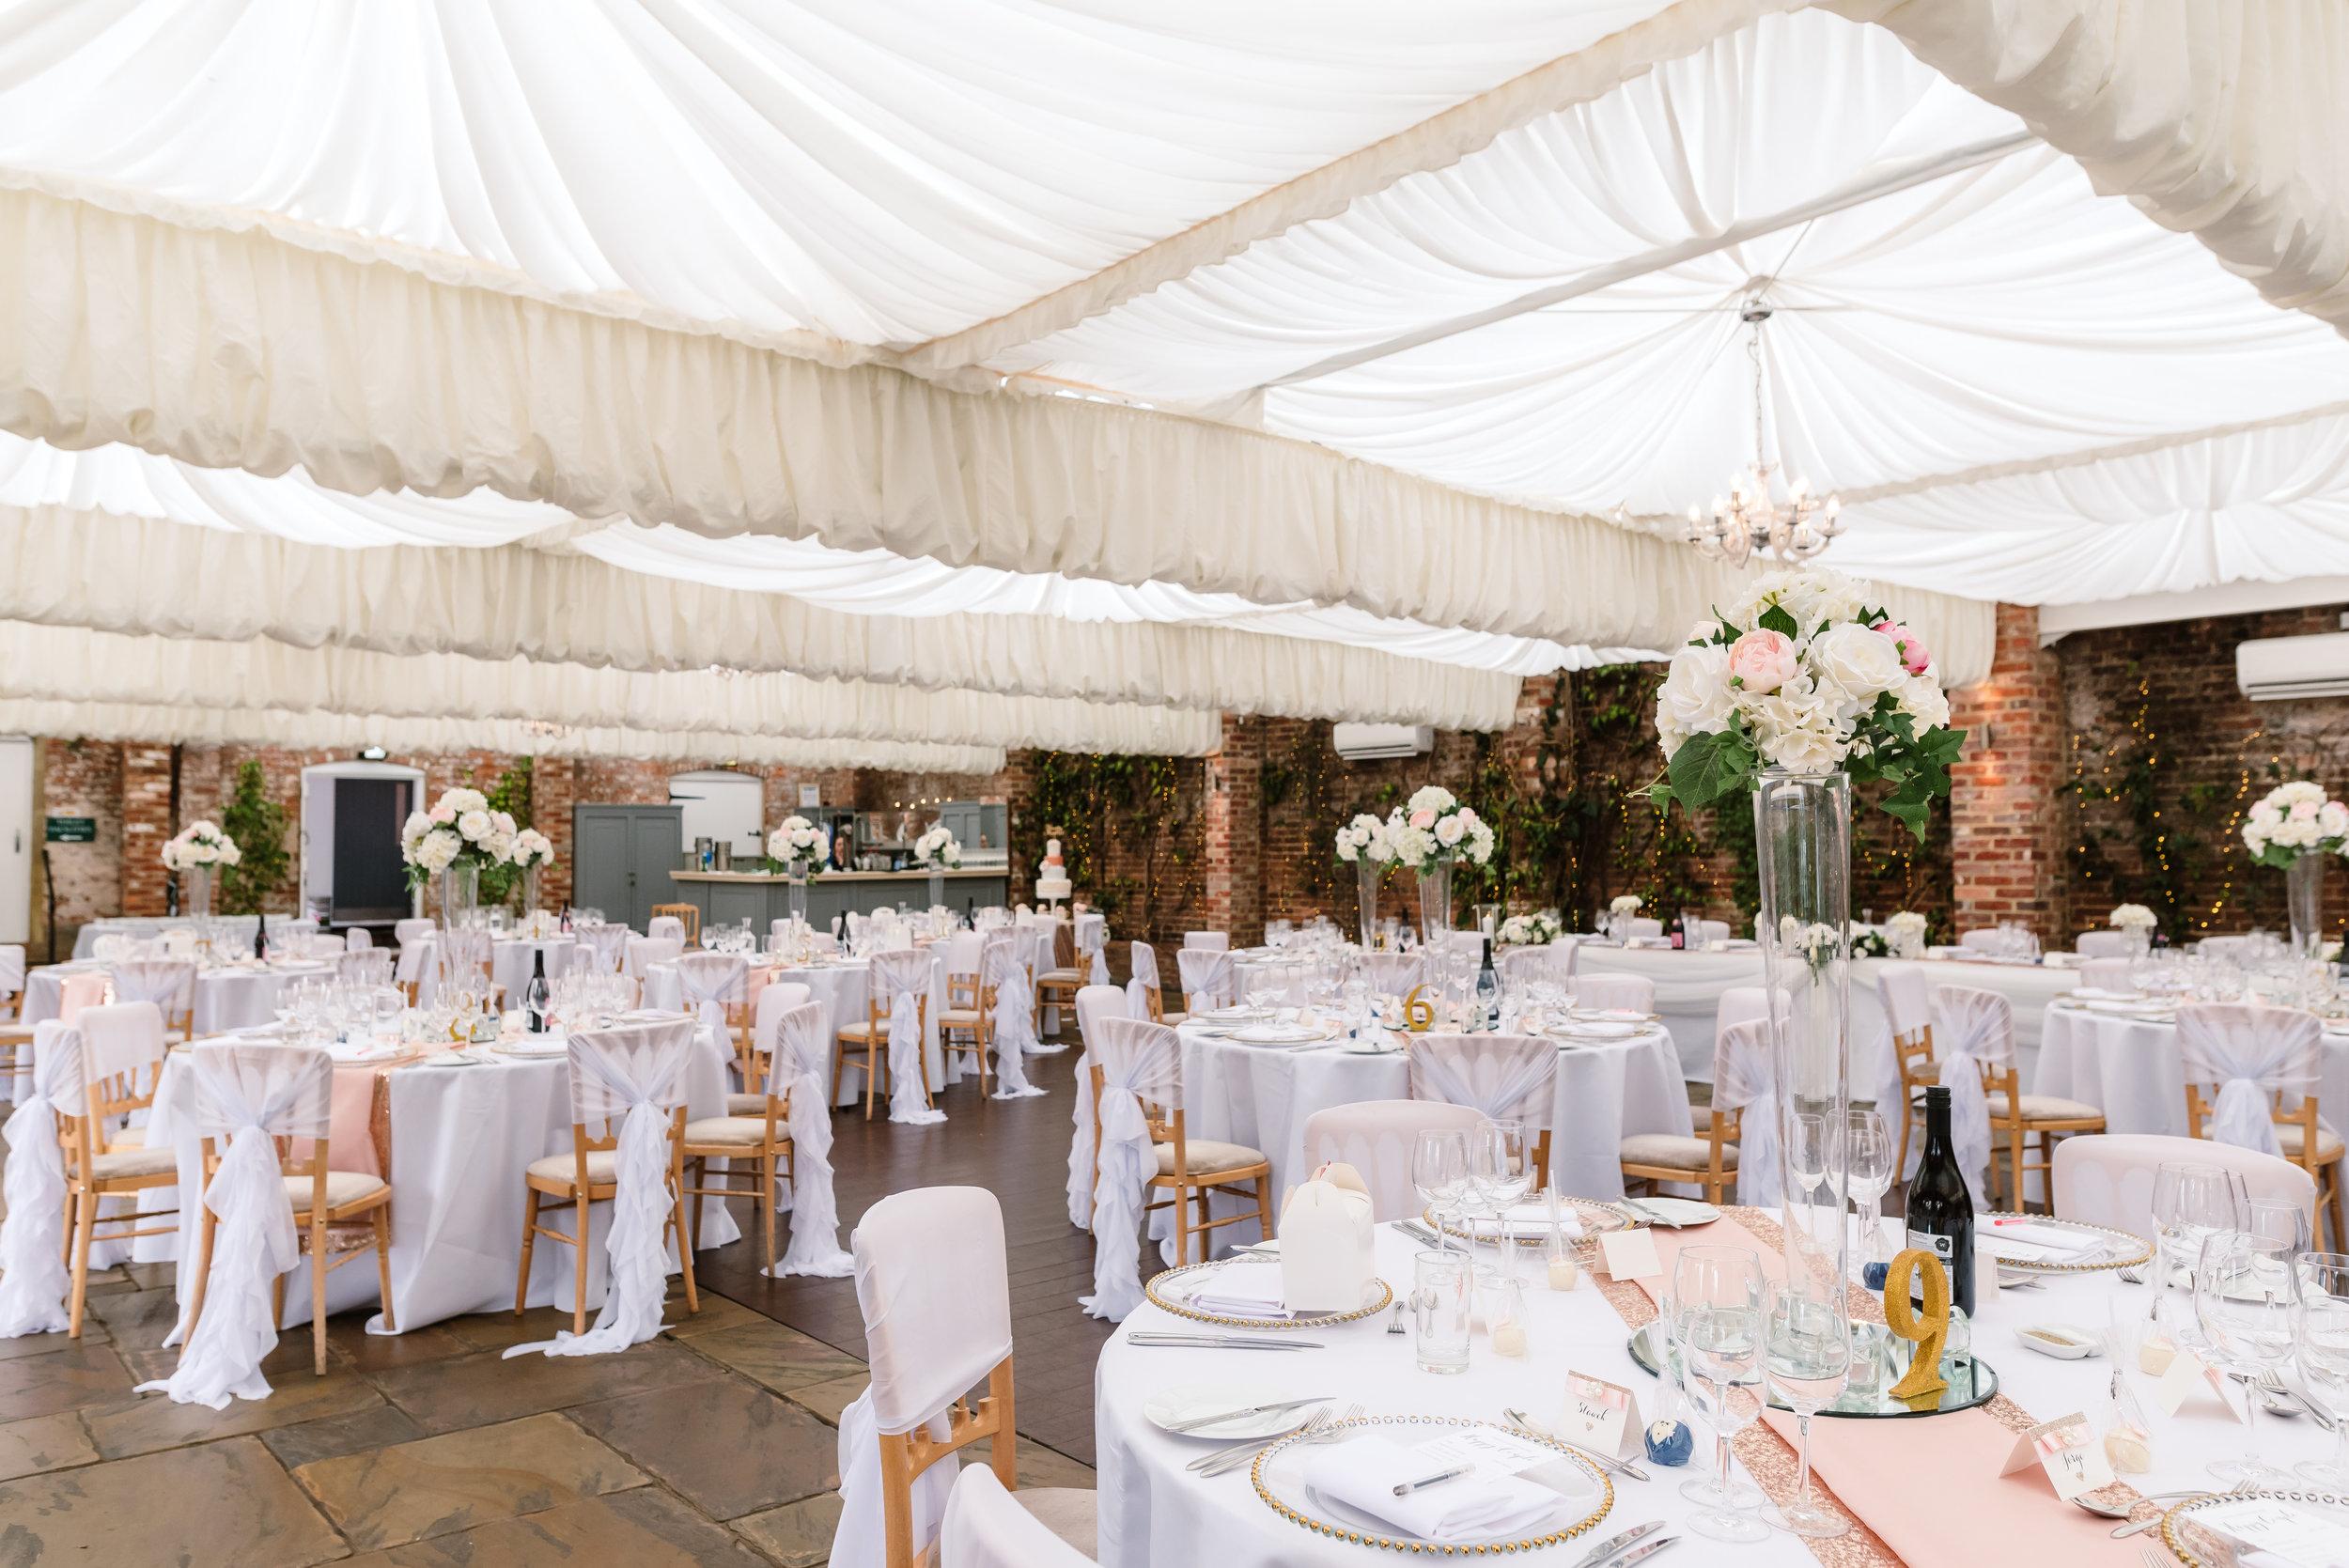 Sarah-Fishlock-Photography : Hampshire-wedding-photographer-hampshire : fleet-wedding-photographer-fleet : Northbrook-Park-Wedding-Photographer : Northbrook-Park-Wedding-Venue : natural-wedding-photographer-hampshire-604.jpg